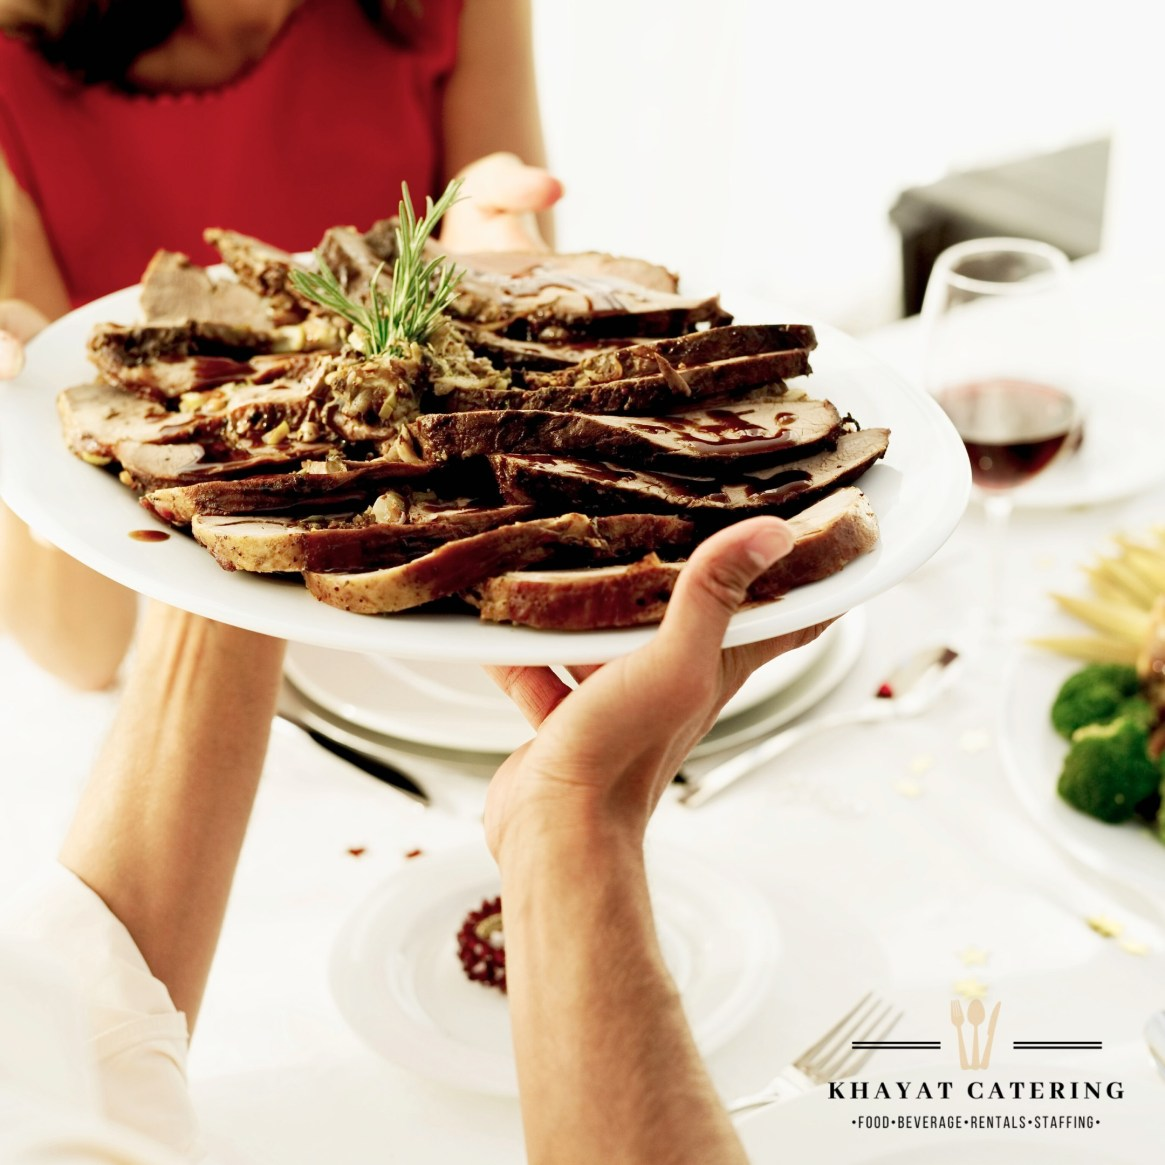 Khayat Catering sliced roast bee